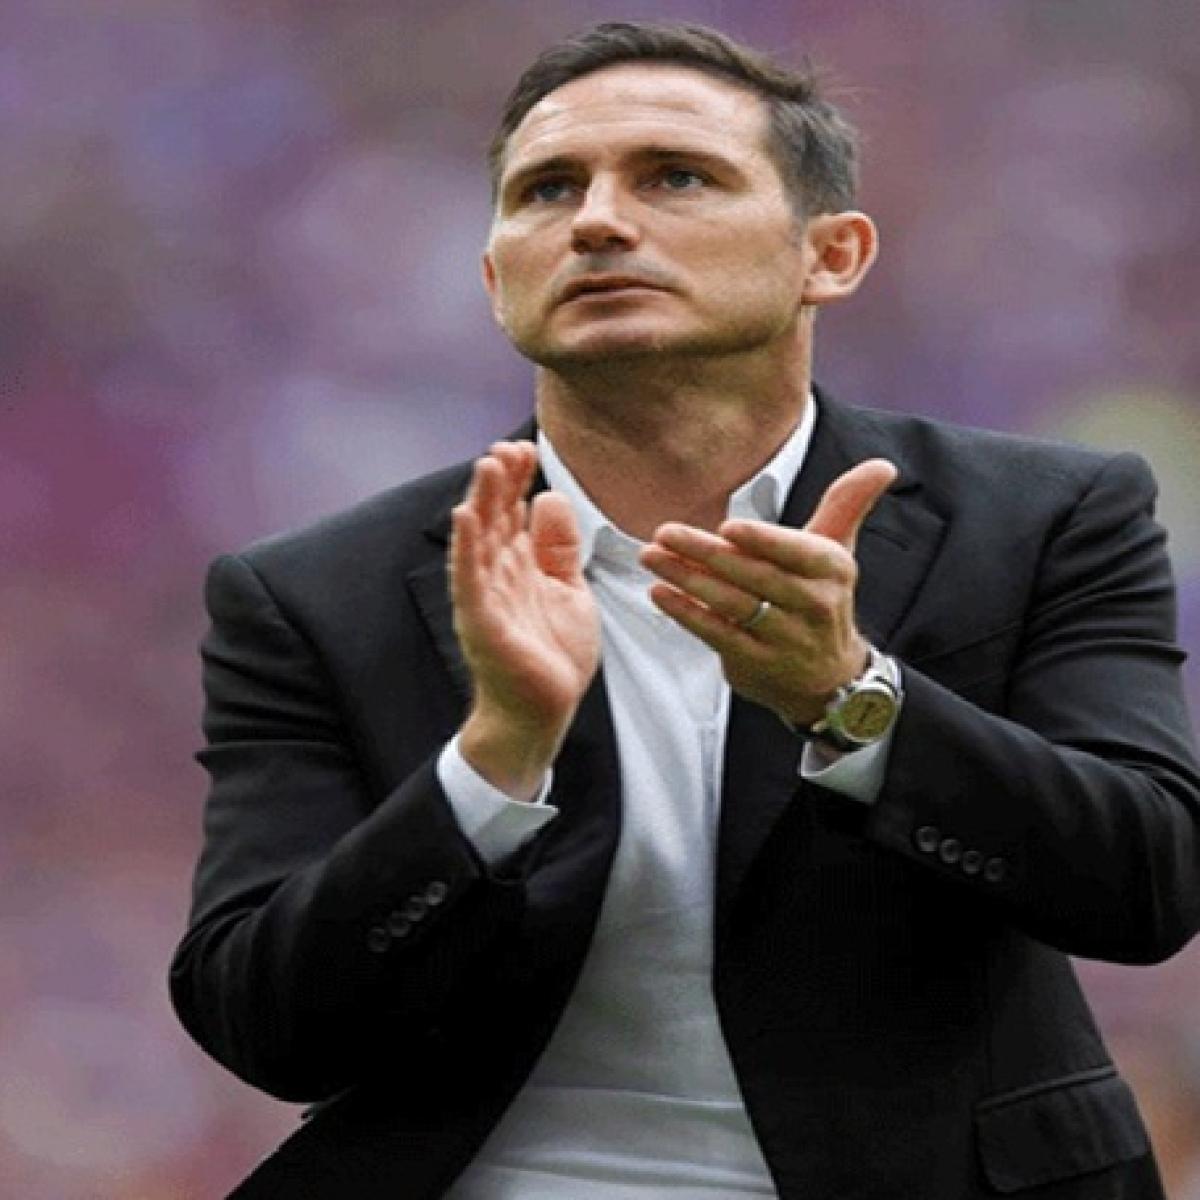 Chelsea FC announces Frank Lampard as new head coach